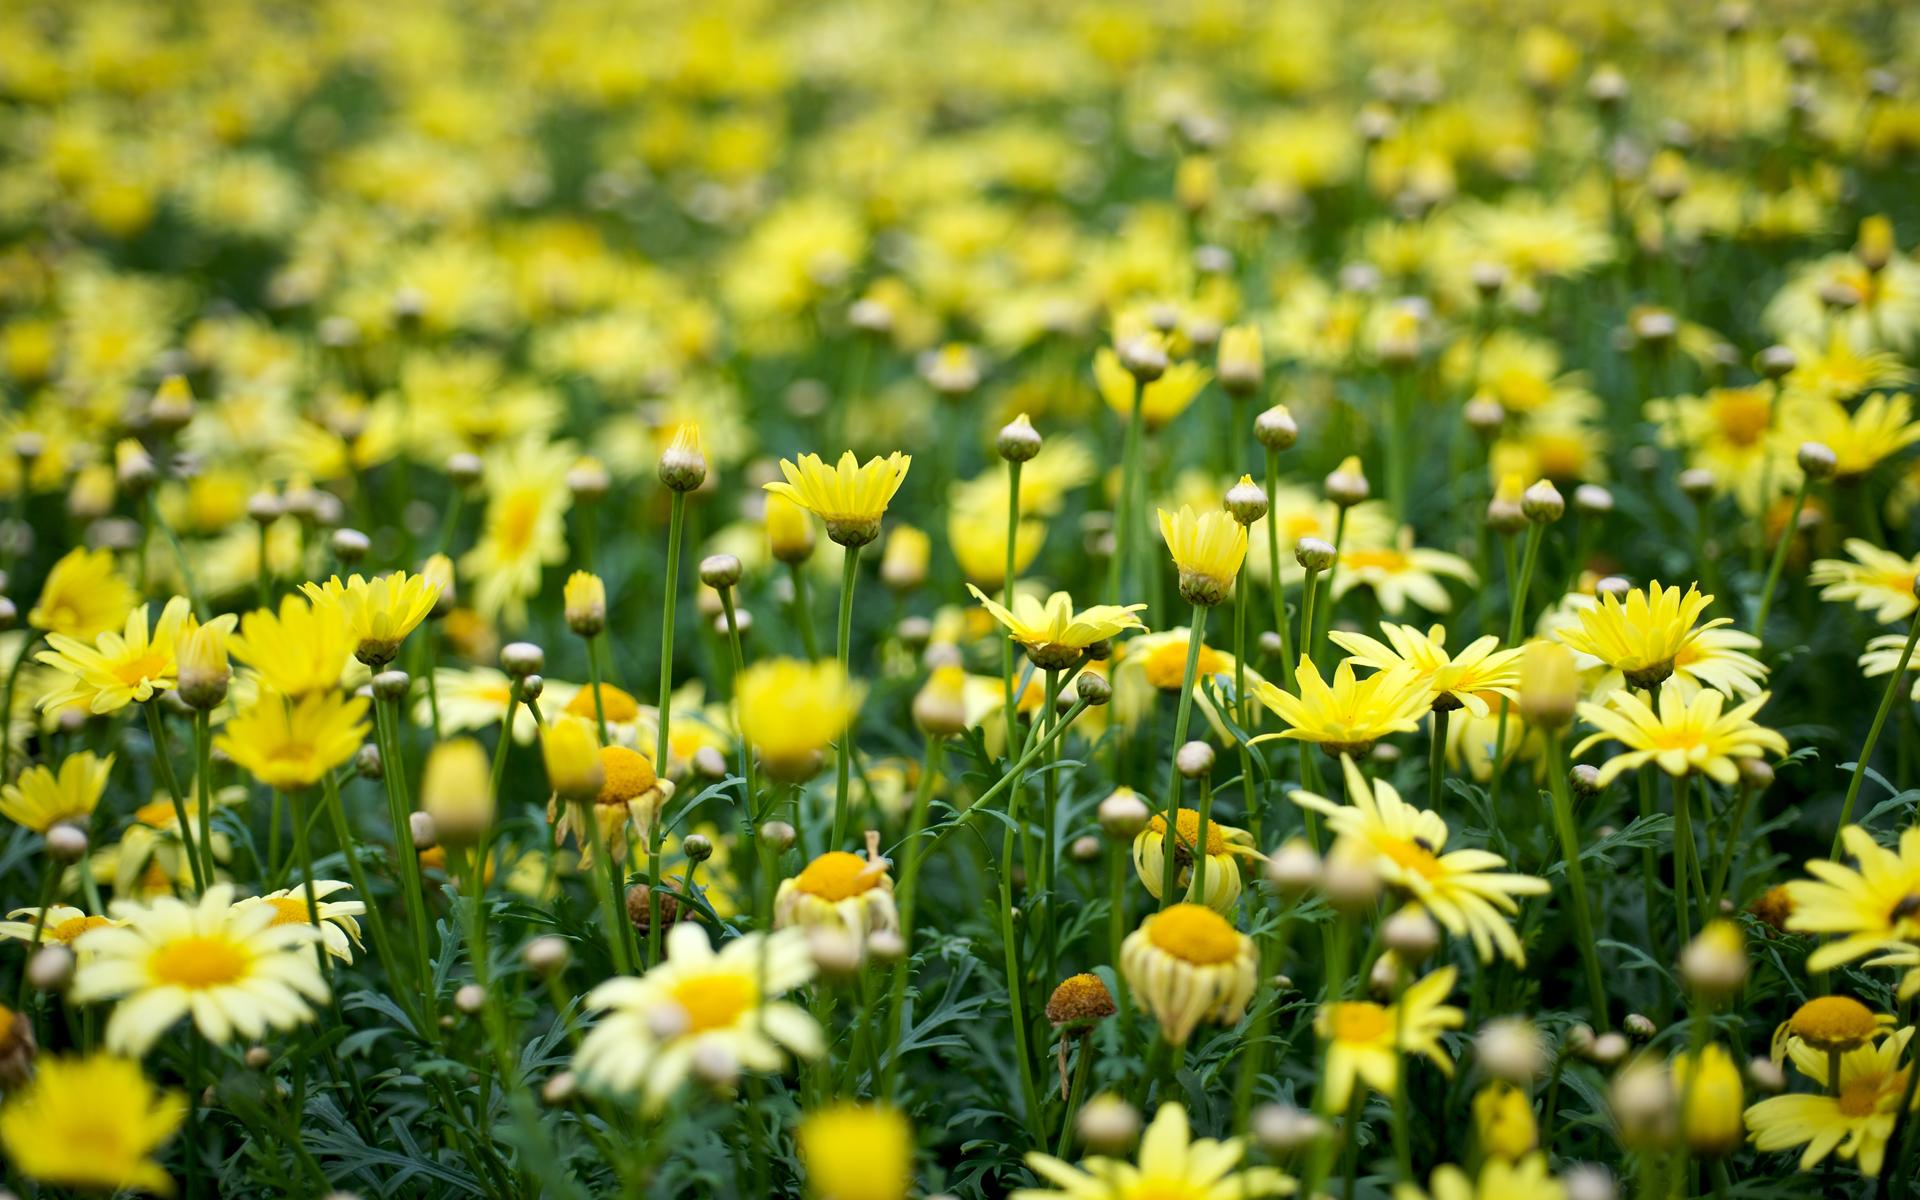 Yellow Flowers Wallpaper 1920x1200